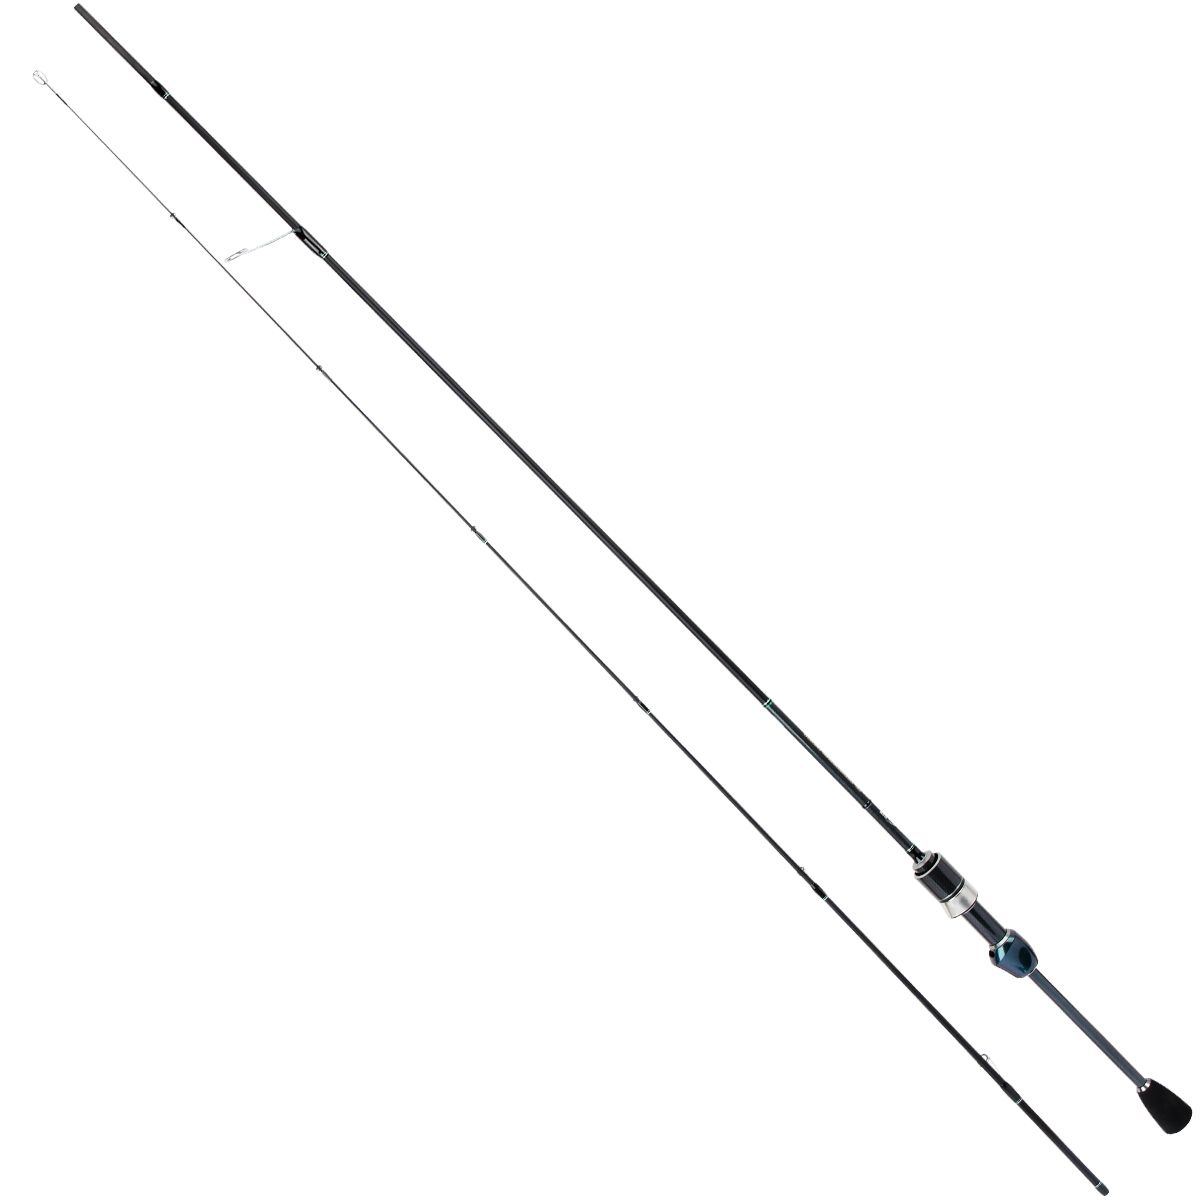 Tsurinoya Spinning Fishing Rod Carp Pole 7 2 1 89m Ul Lightweight Carbon Sea Fishing Accessories With Fuj Portable Fishing Rod Bass Fishing Rods Fishing Tools